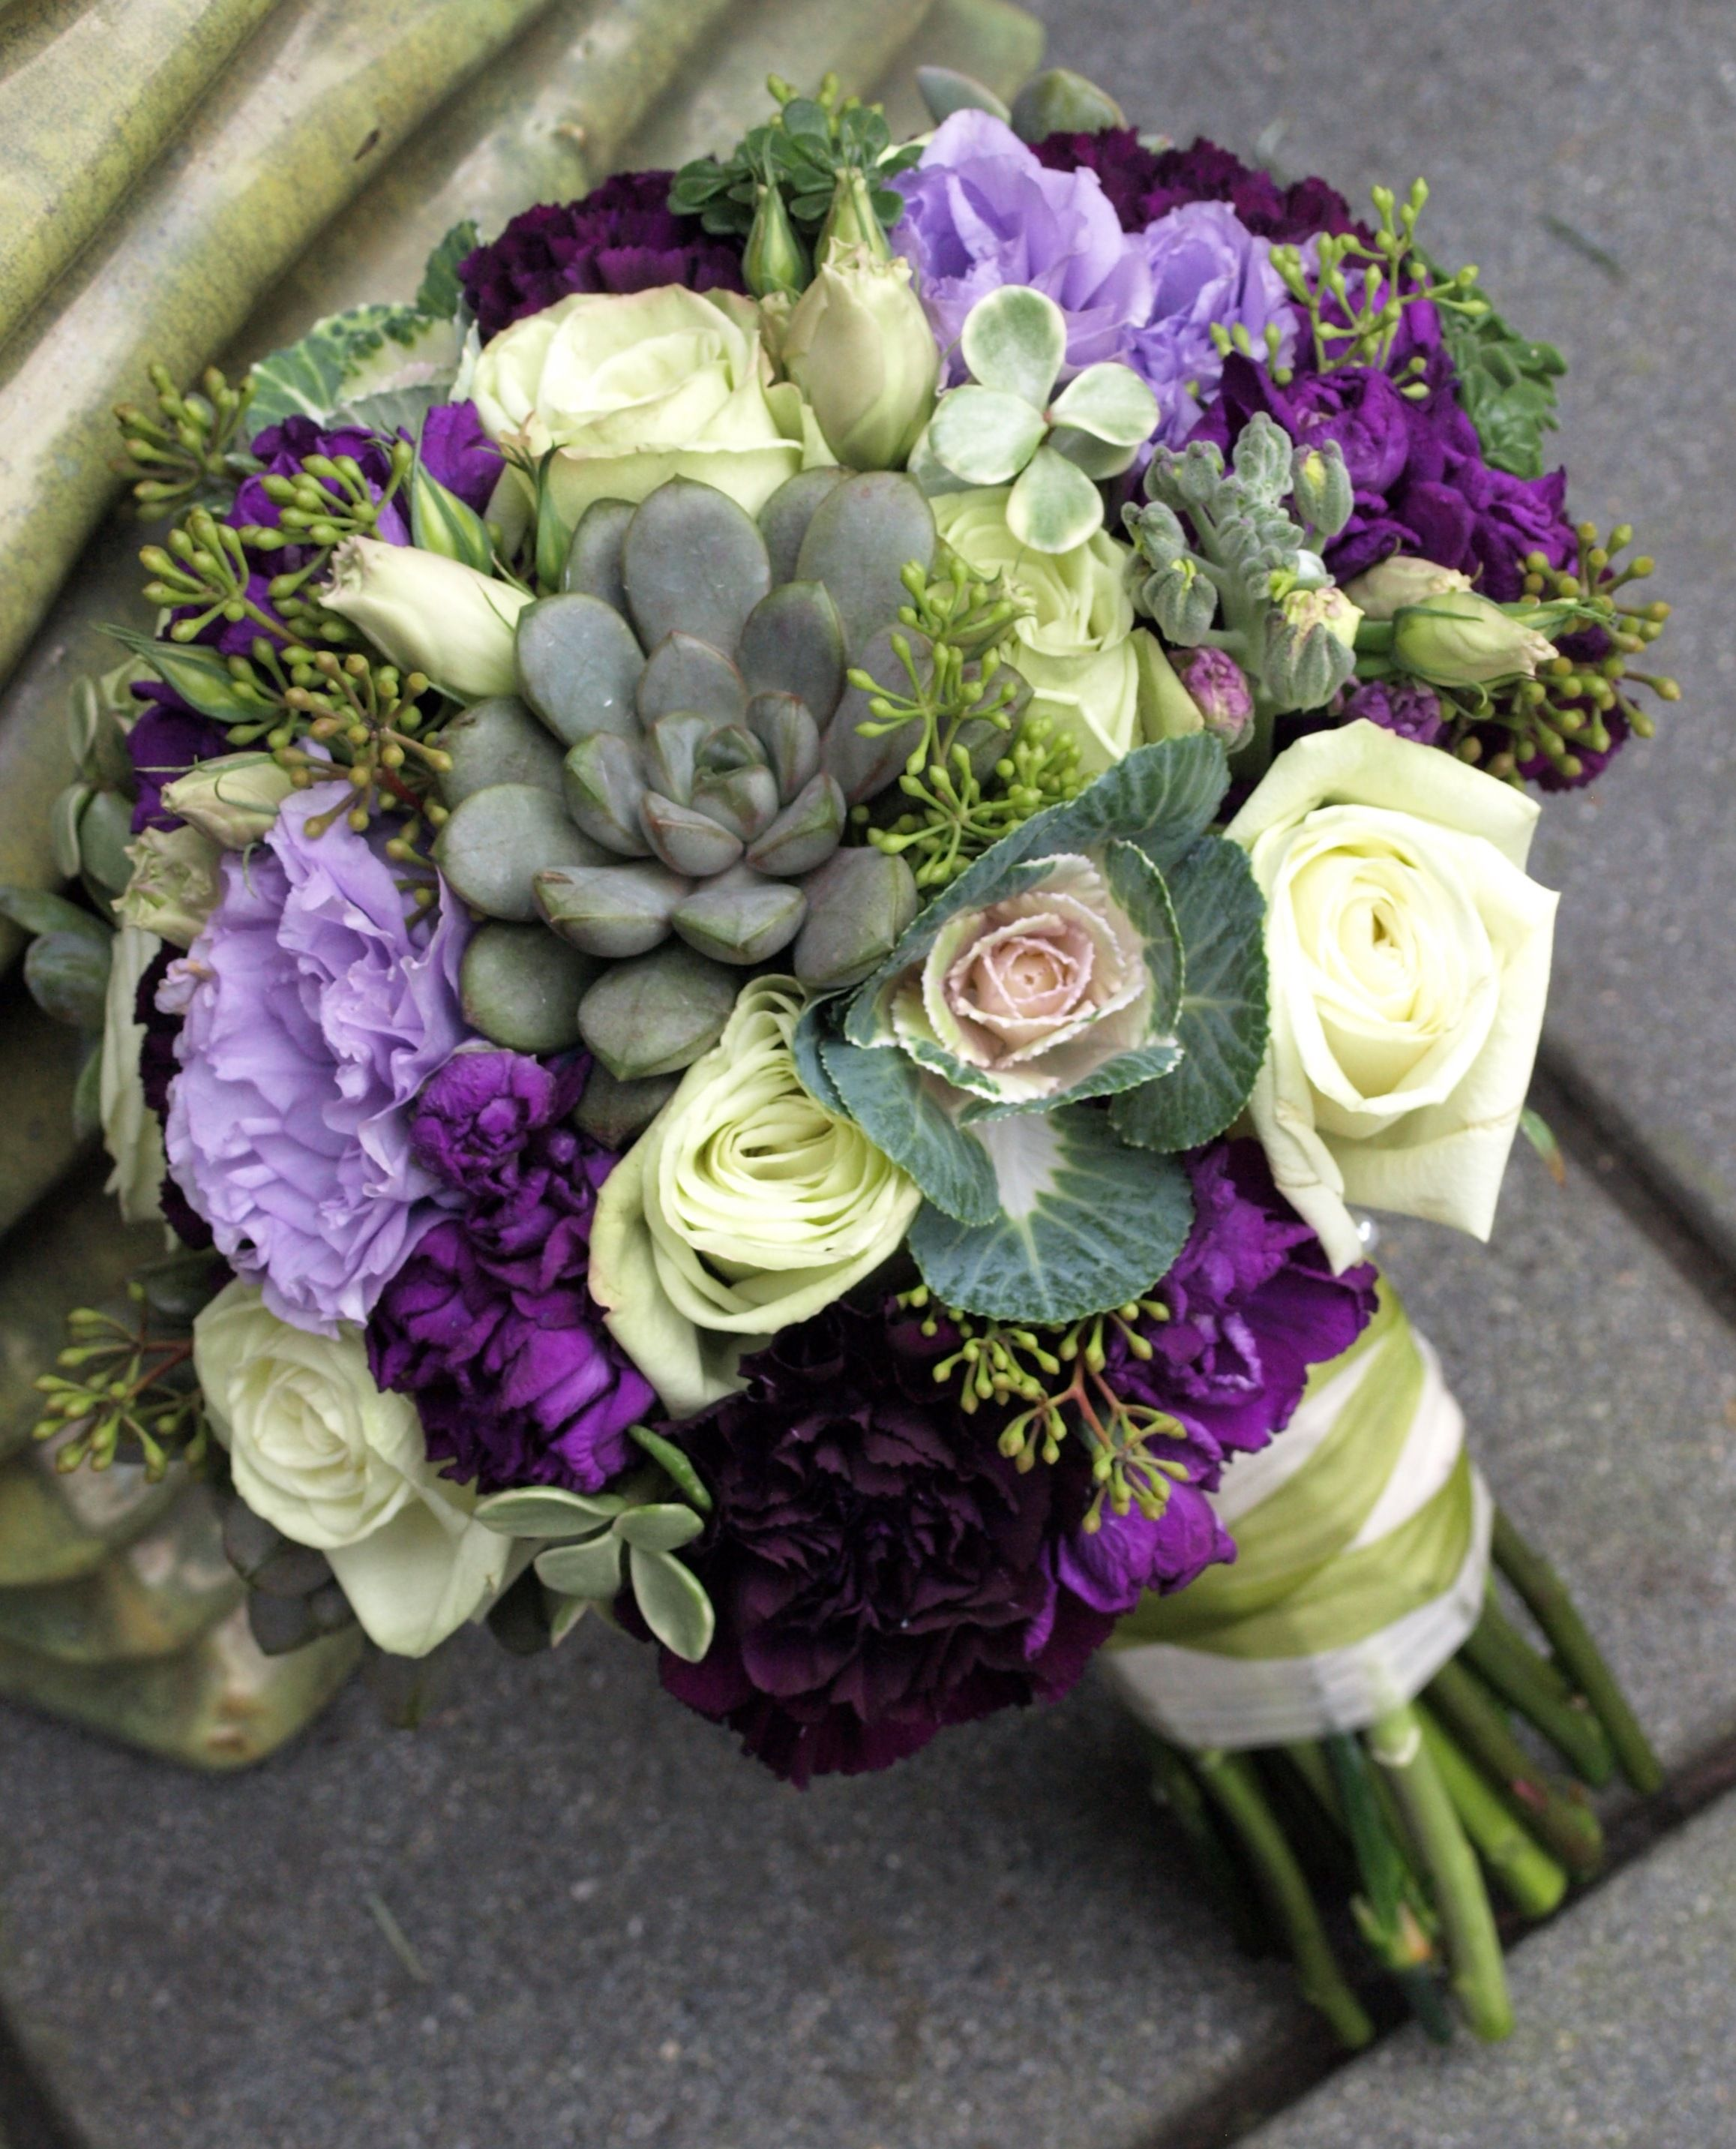 Succulent wedding bouquet, looks vibrant! Use flowers like